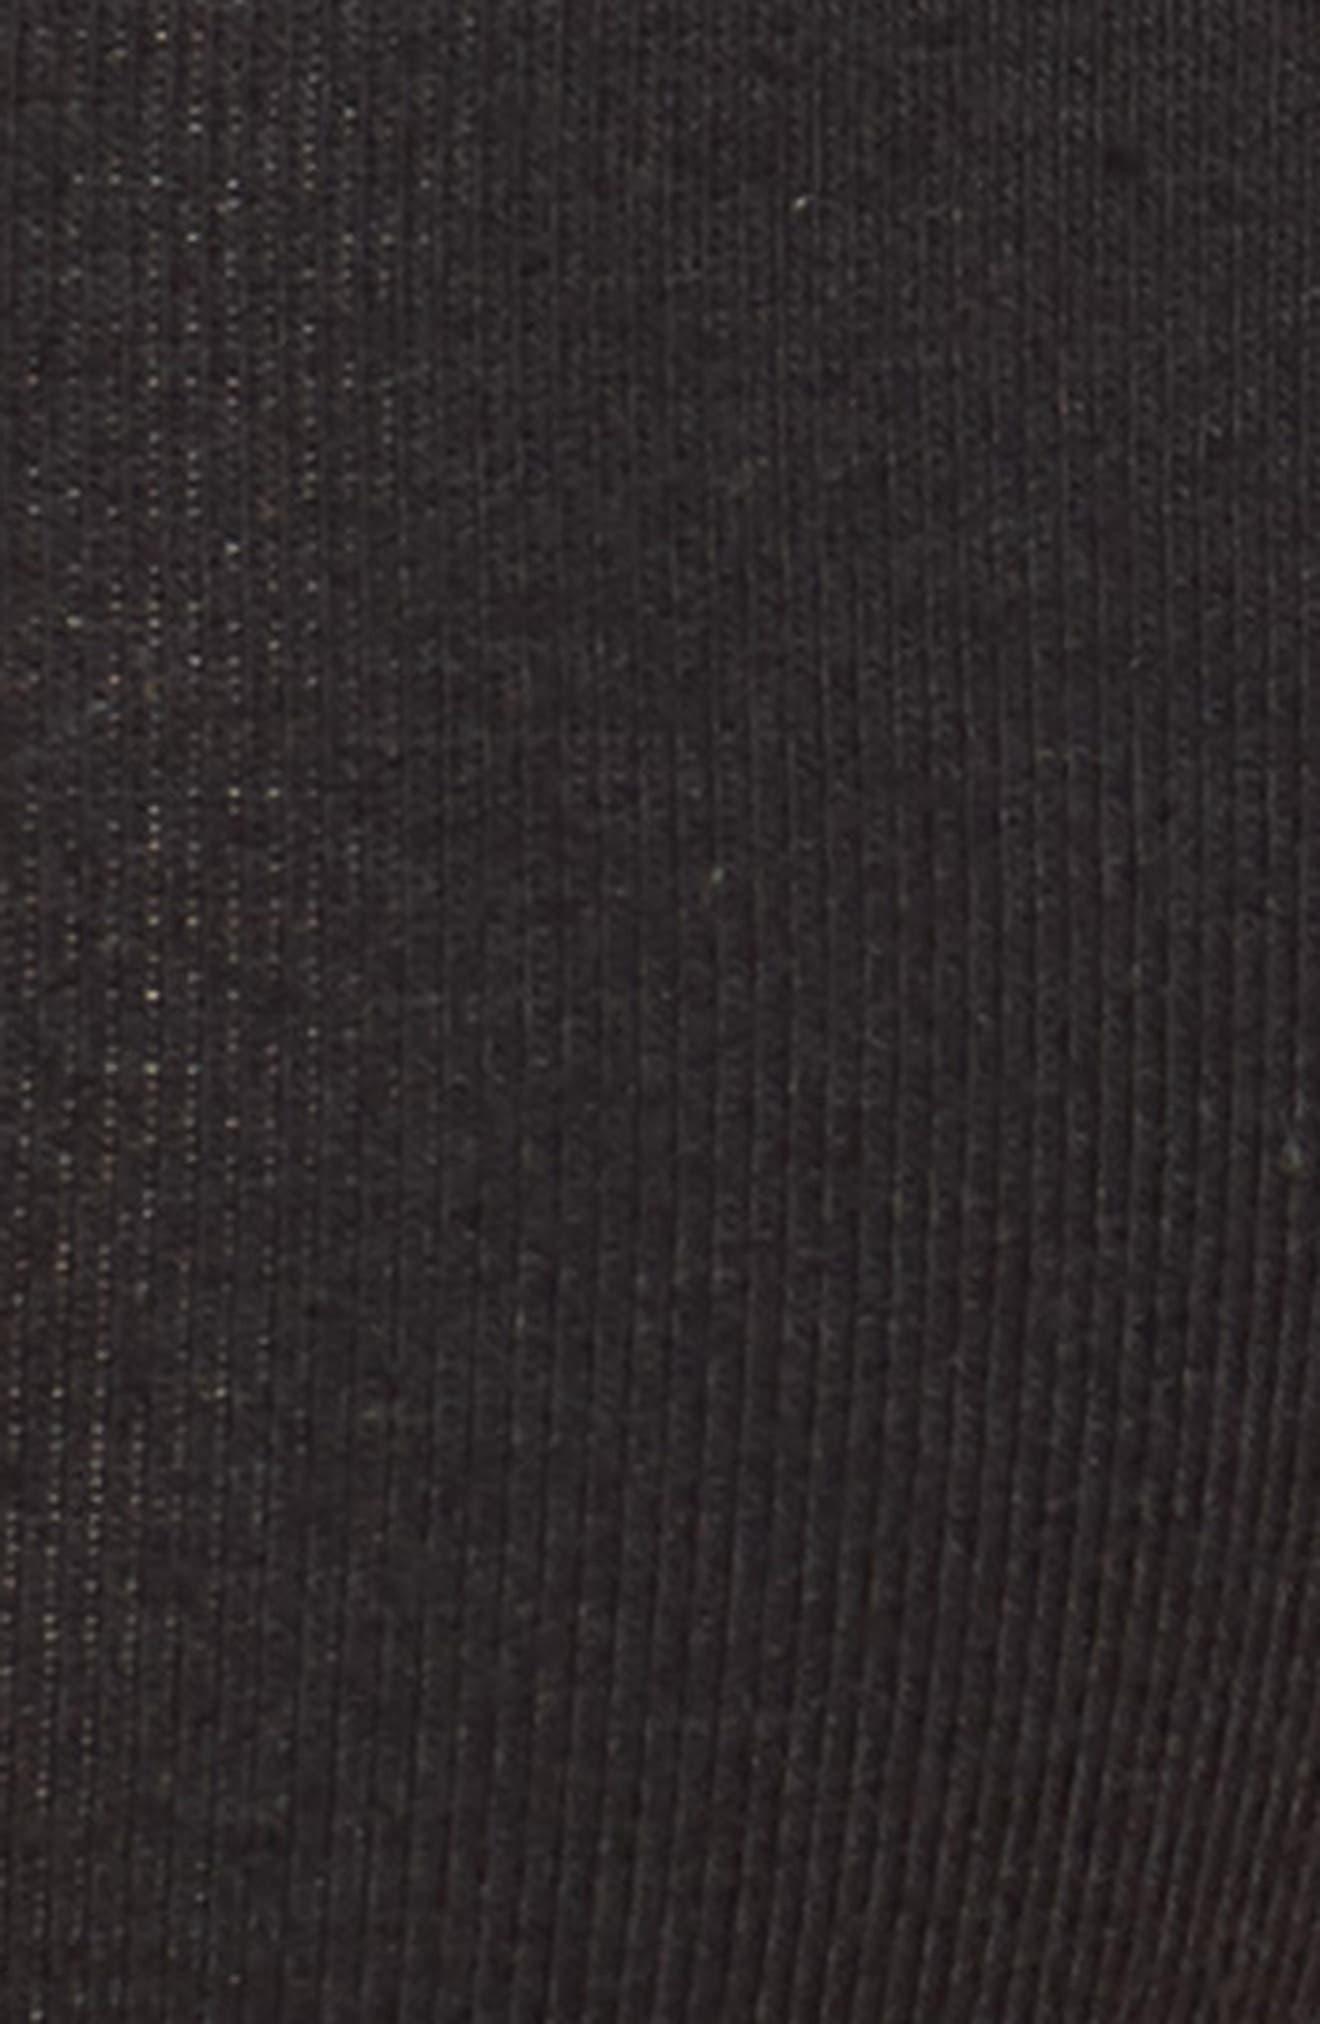 Cotton Thong,                             Alternate thumbnail 4, color,                             BLACK/ GOLD